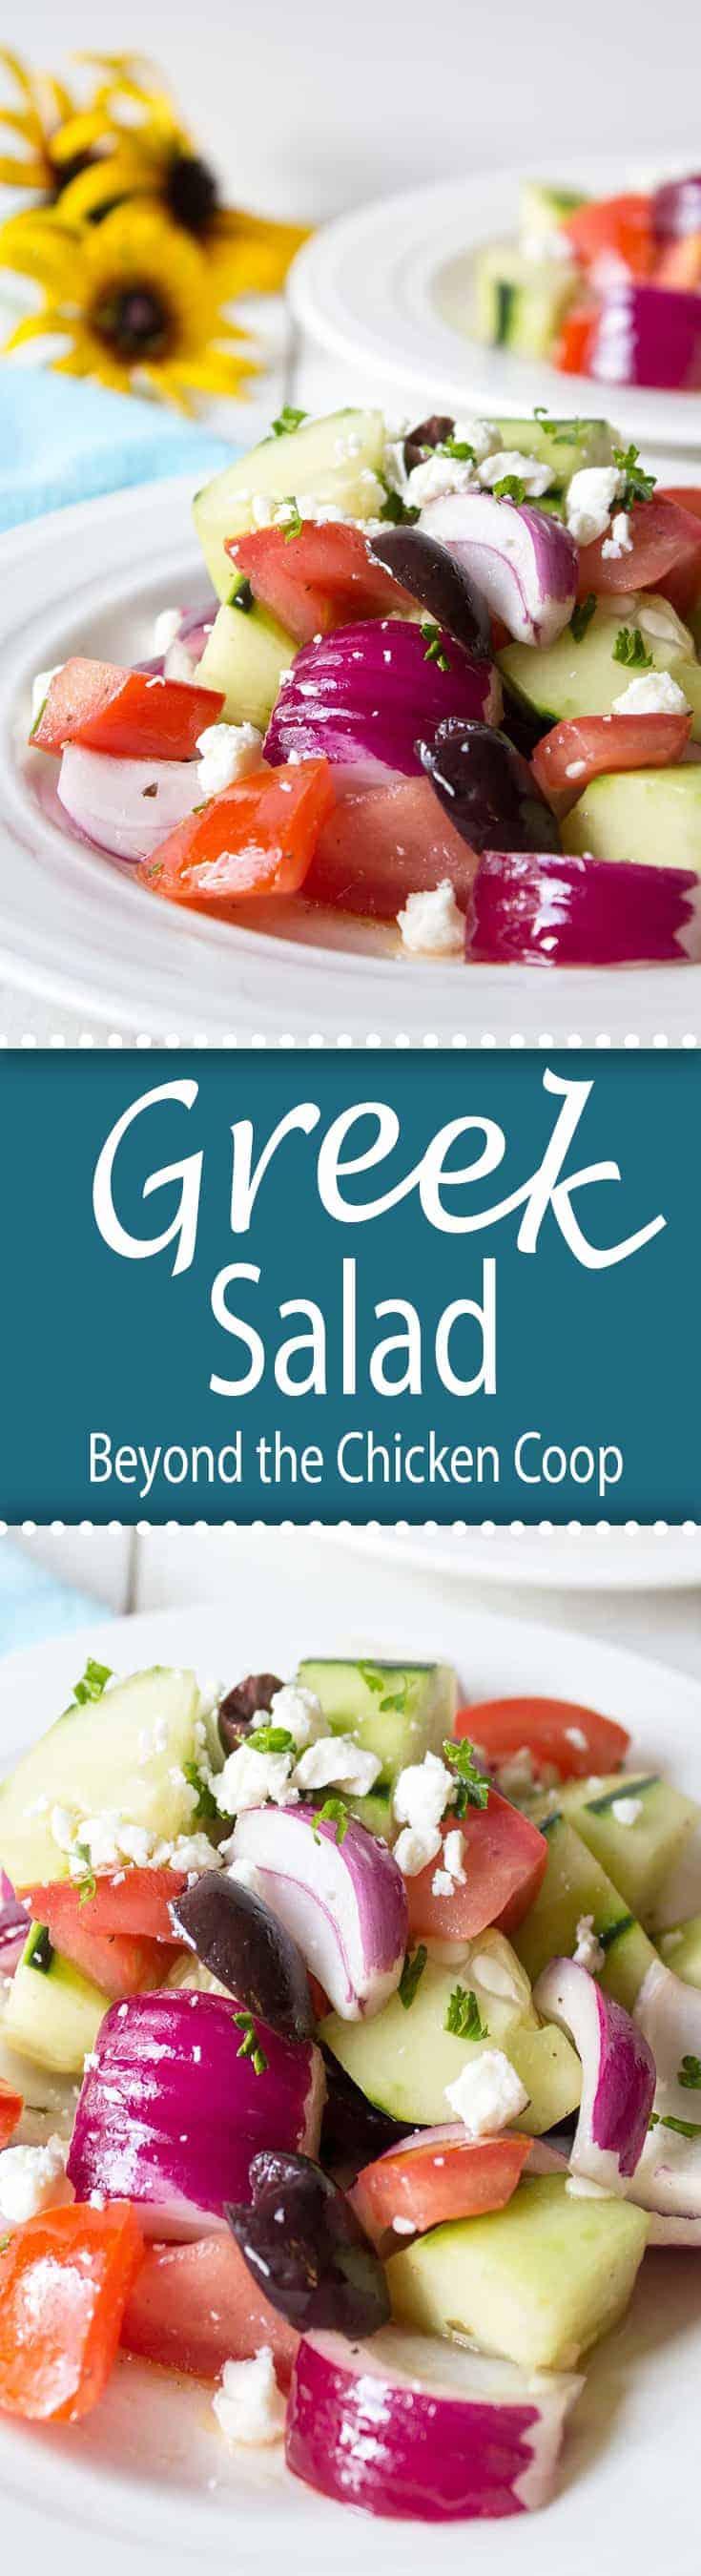 Greek Salad with fresh tomatoes, cucumbers and feta cheese.